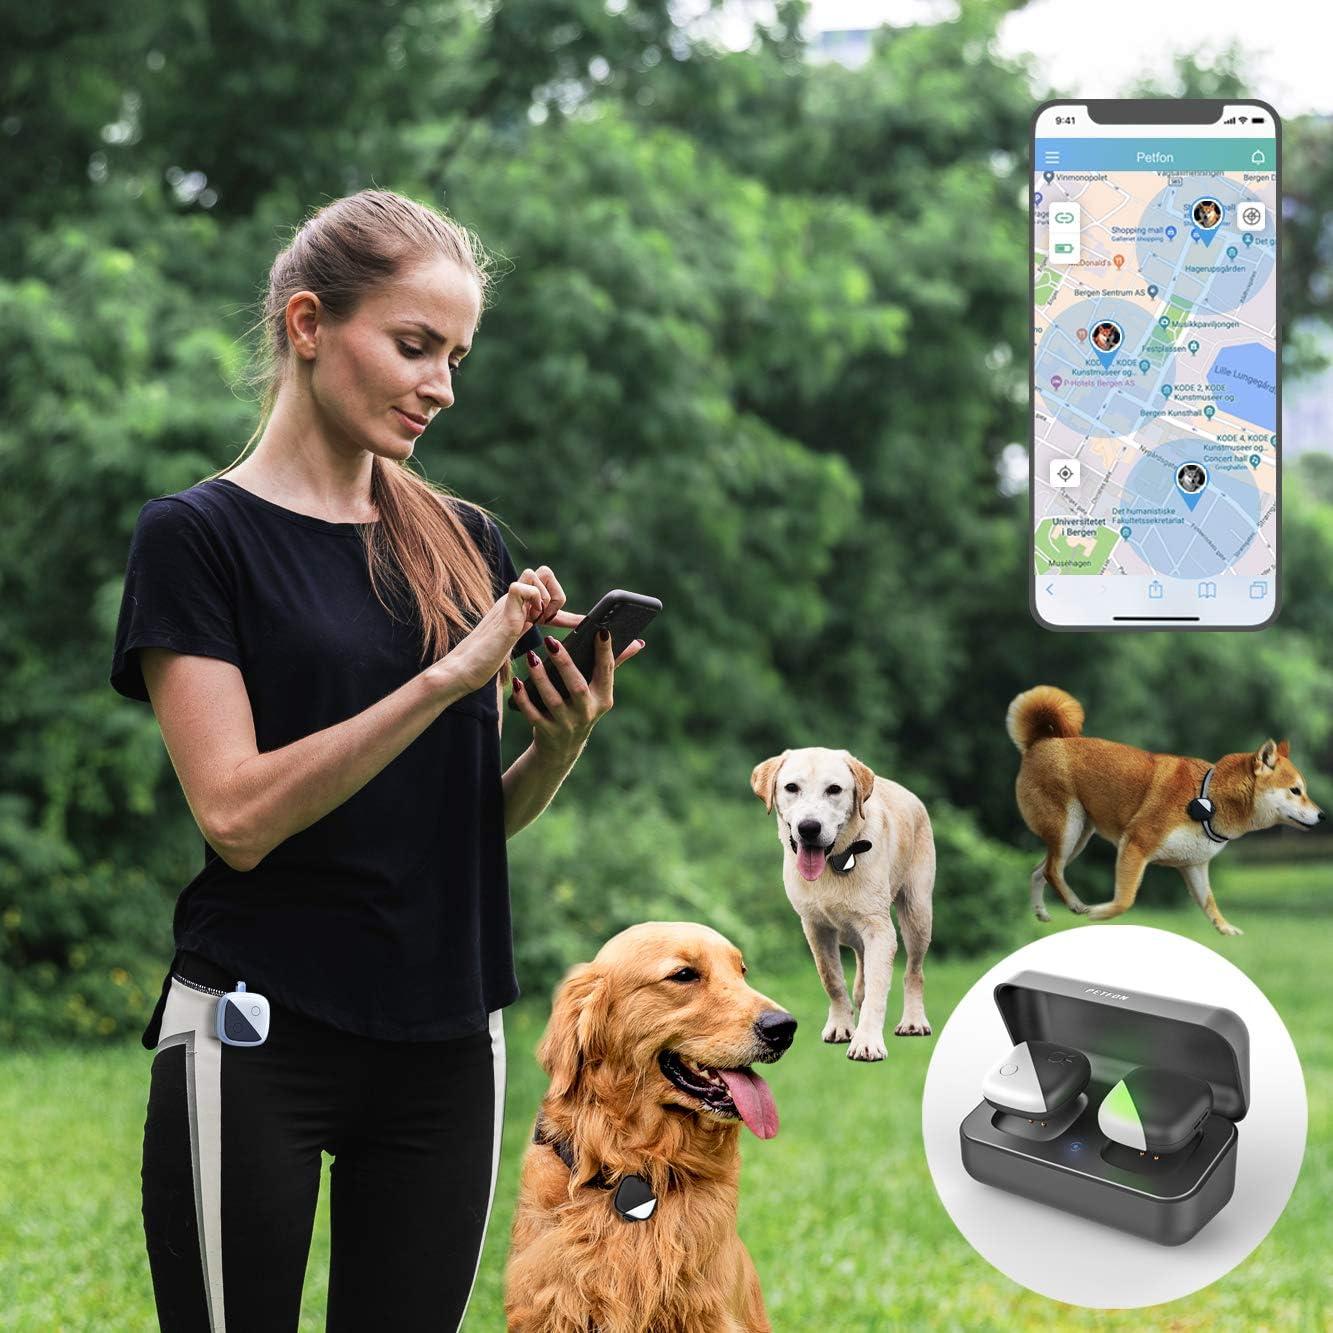 Pet Gps Tracker Dog Locator Bell-real-time Activity Control Wasserdichte F/ür Hund Katze Kuh Schaf Schwarz Pet Supplies